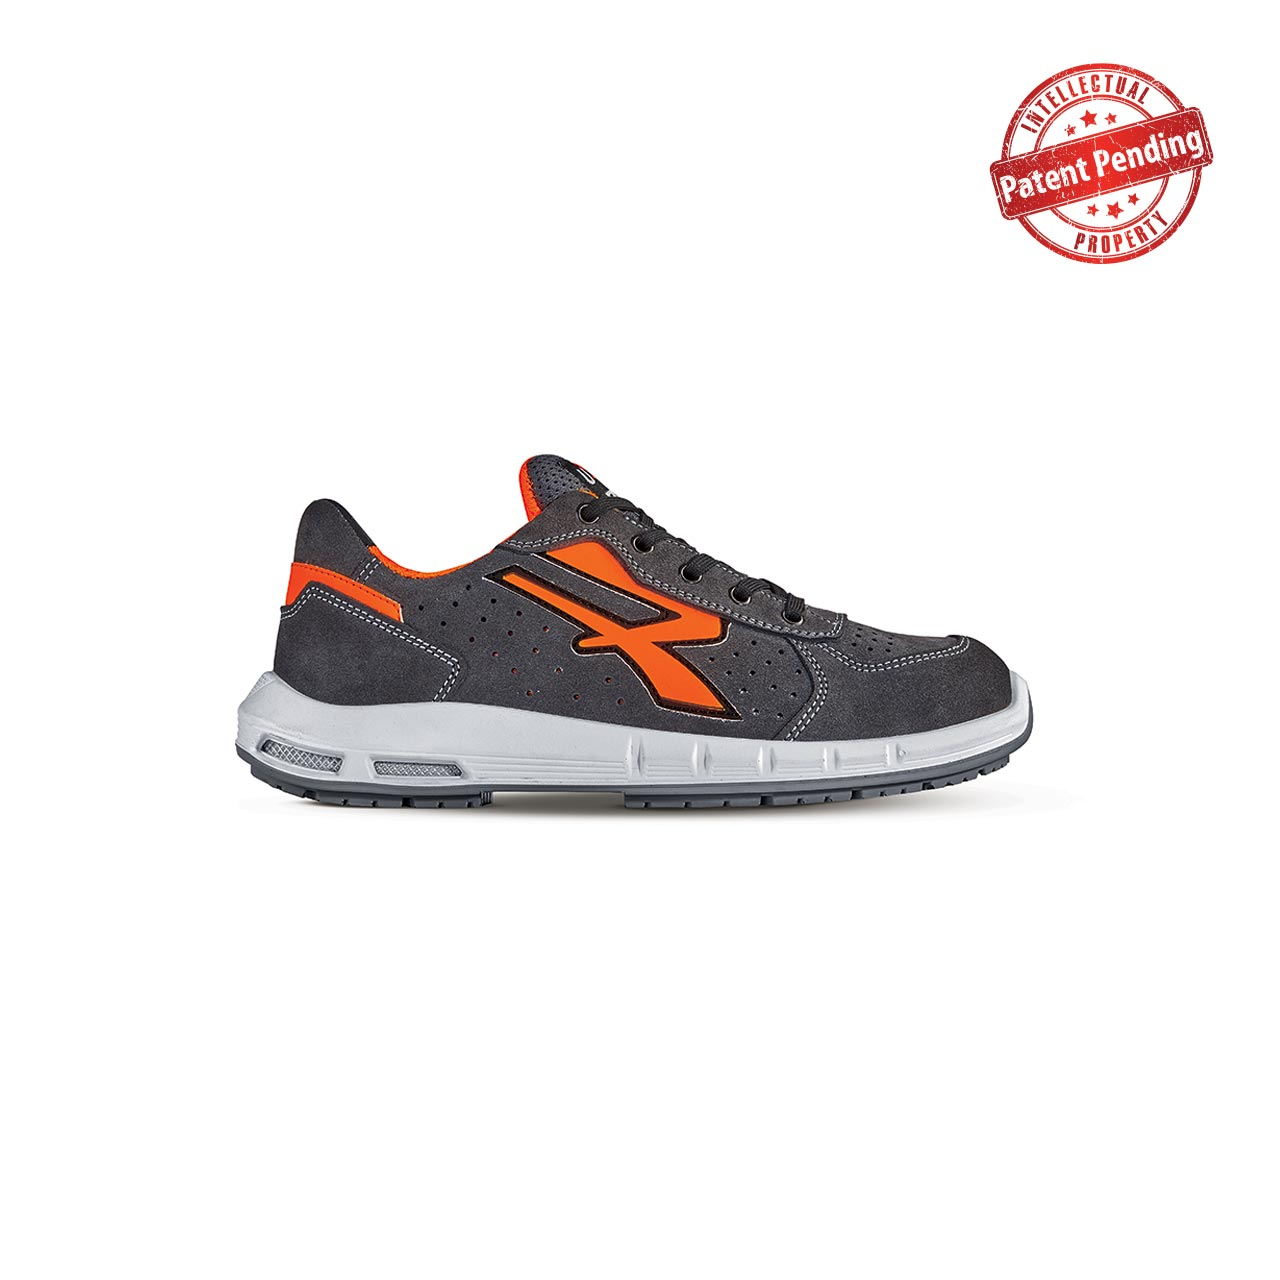 scarpa antinfortunistica upower modello sirio plus linea redup plus vista laterale